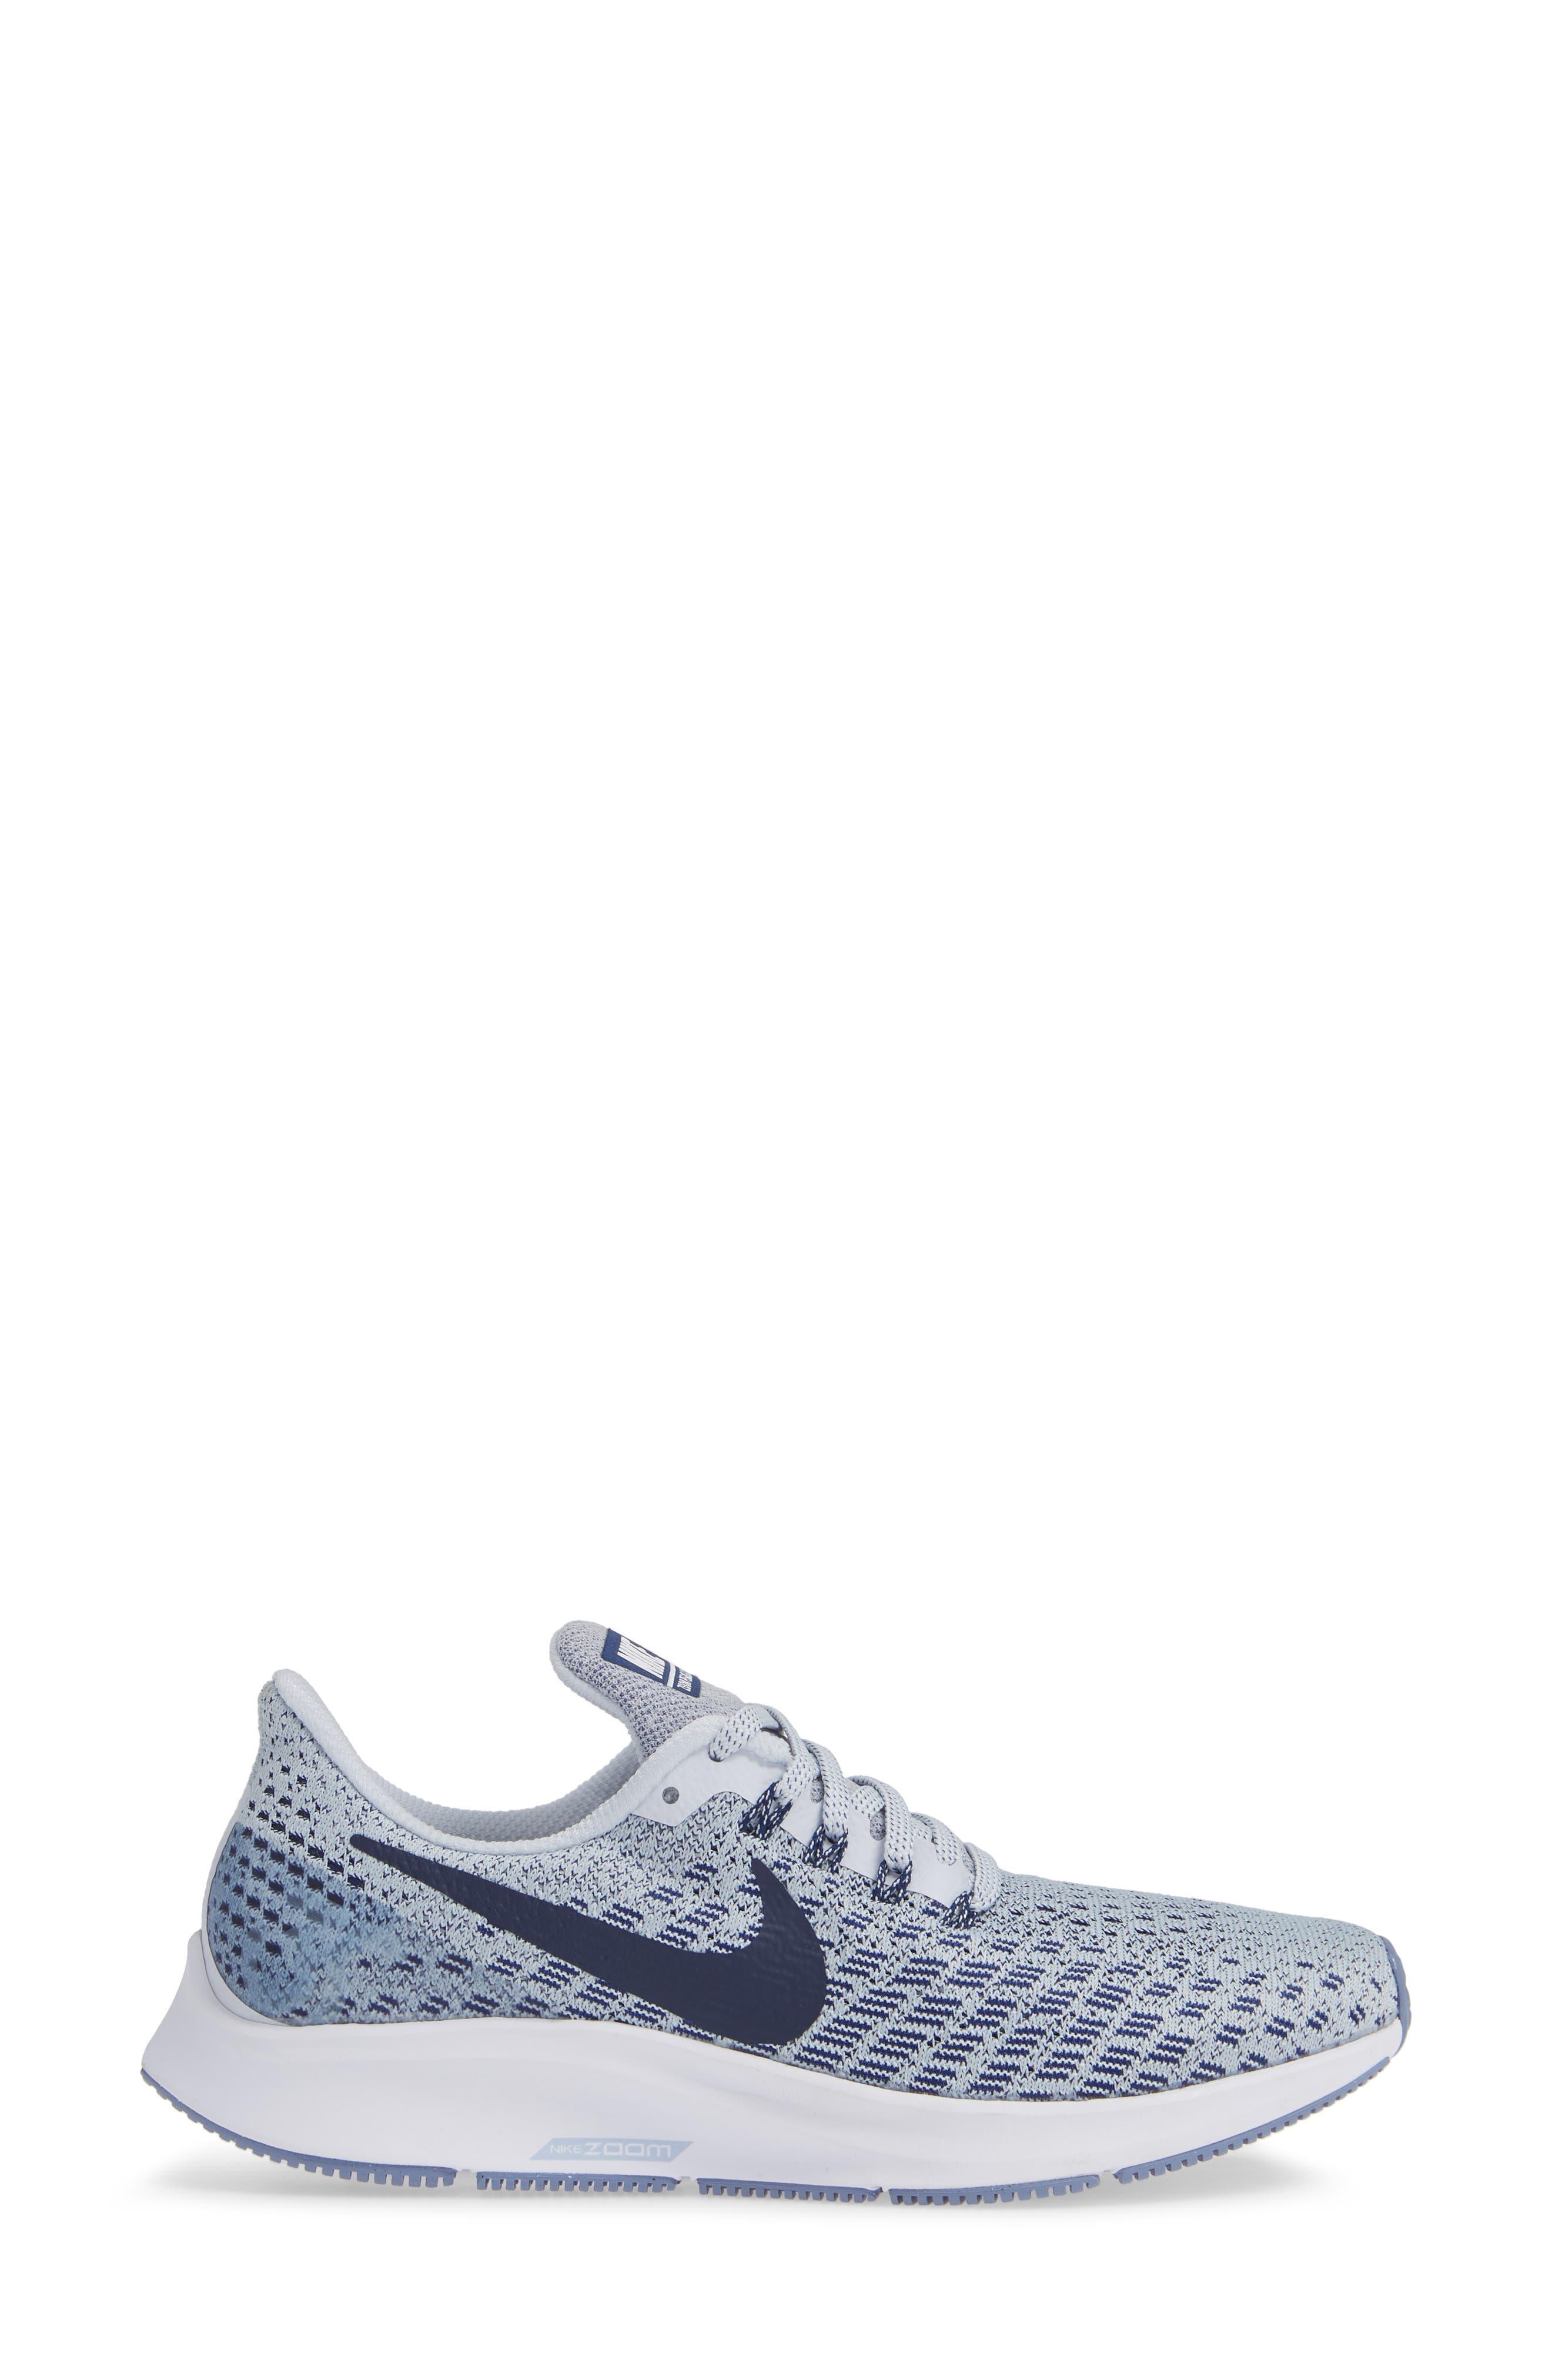 Air Zoom Pegasus 35 Running Shoe,                             Alternate thumbnail 3, color,                             GREY/ BLUE/ WHITE/ ALUMINUM